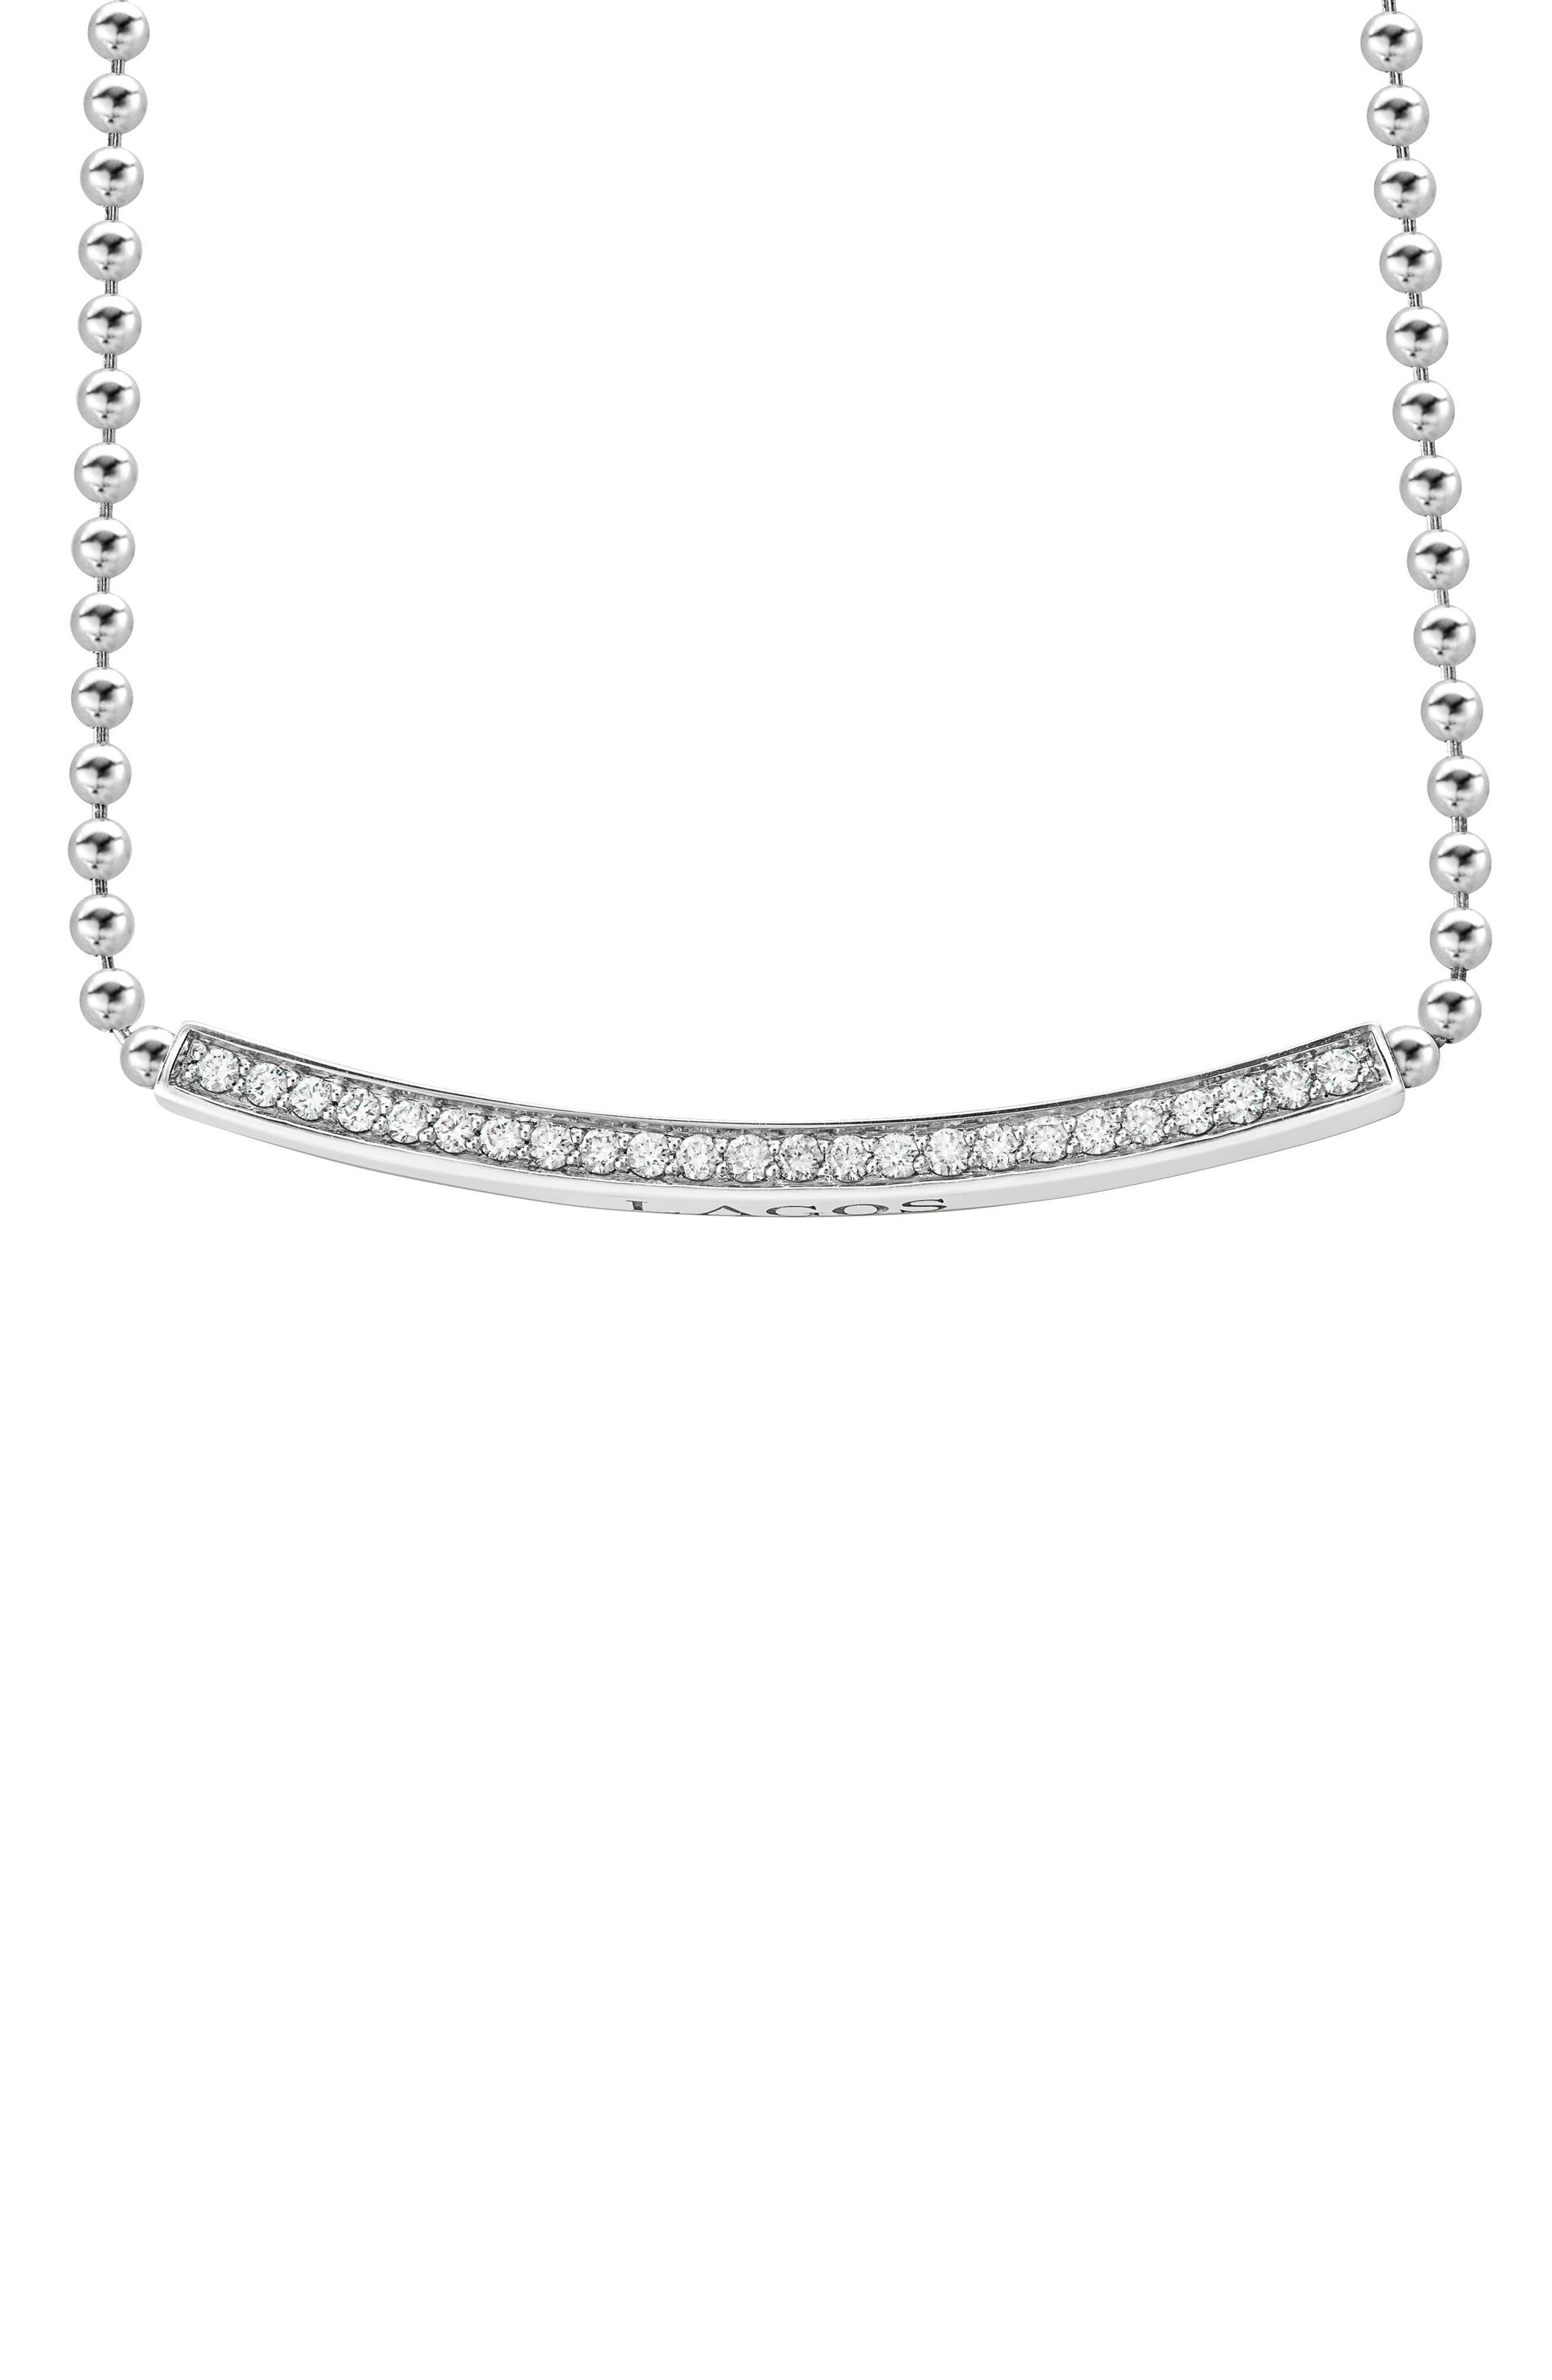 Caviar Spark Diamond Bar Necklace,                             Alternate thumbnail 2, color,                             Silver/ Diamond